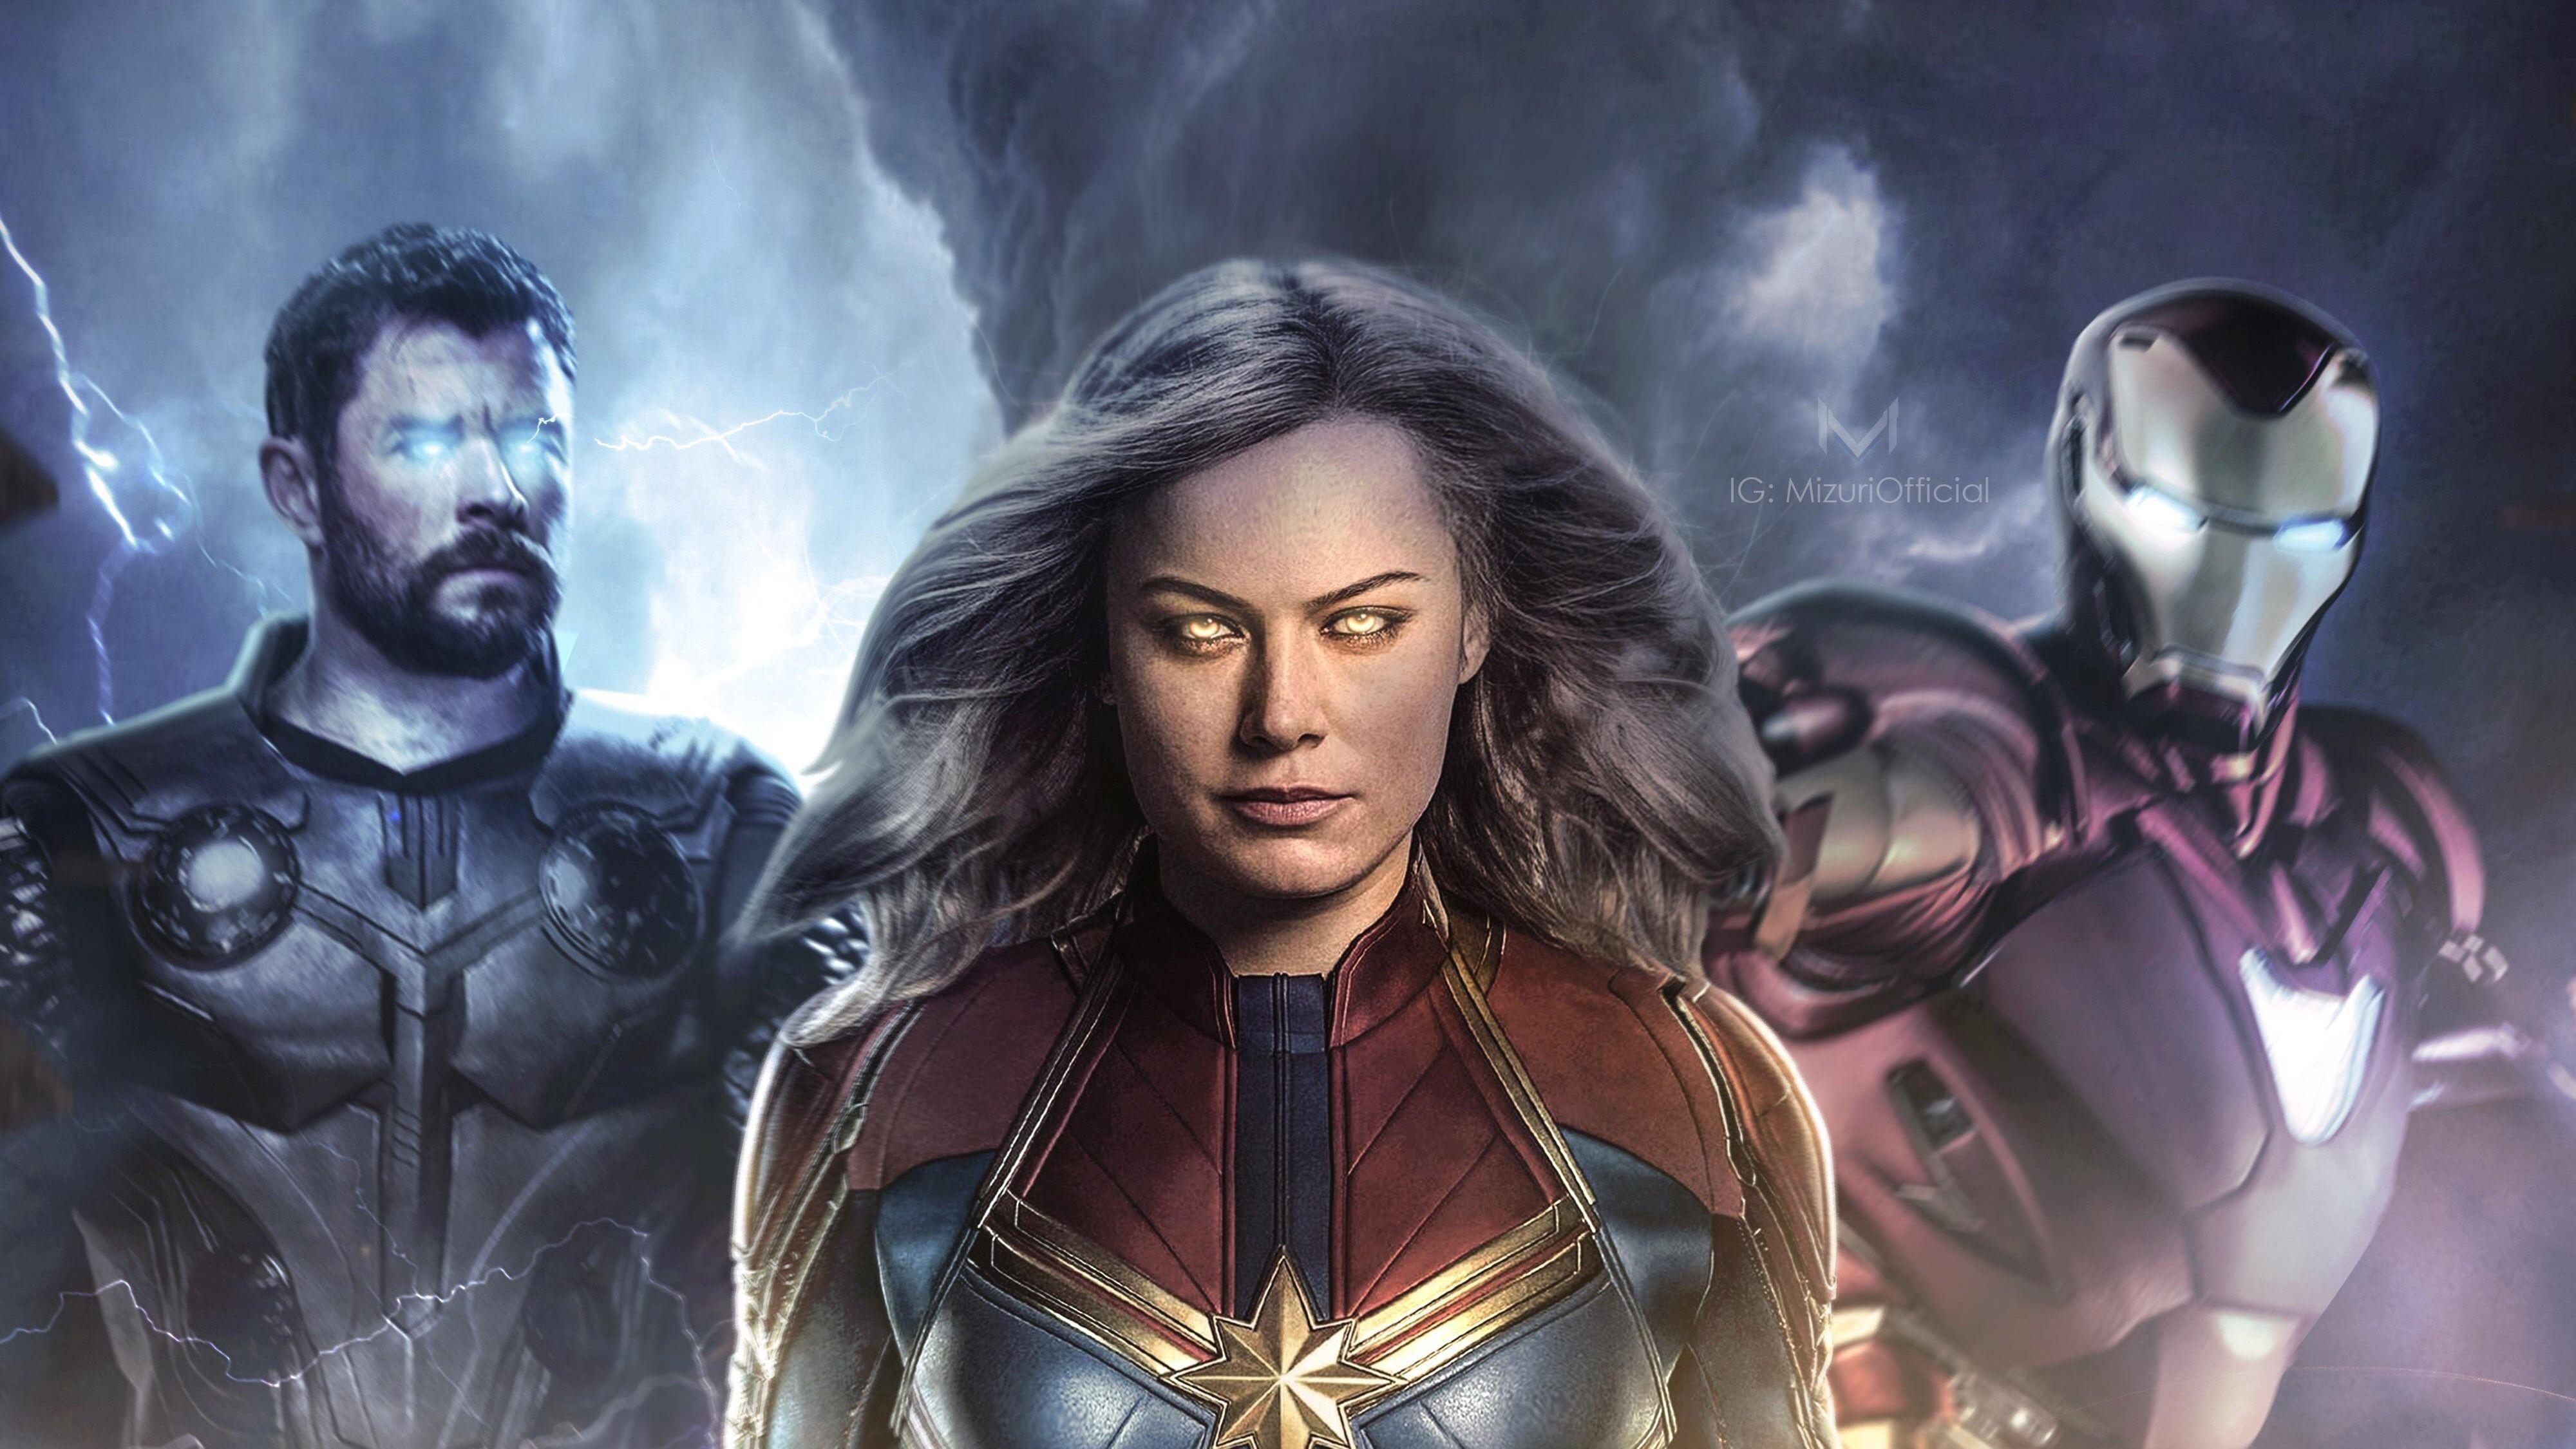 Avengers Endgame Wallpapers Wallpaper Cave In 2020 Marvel Wallpaper Hd Avengers Marvel Wallpaper